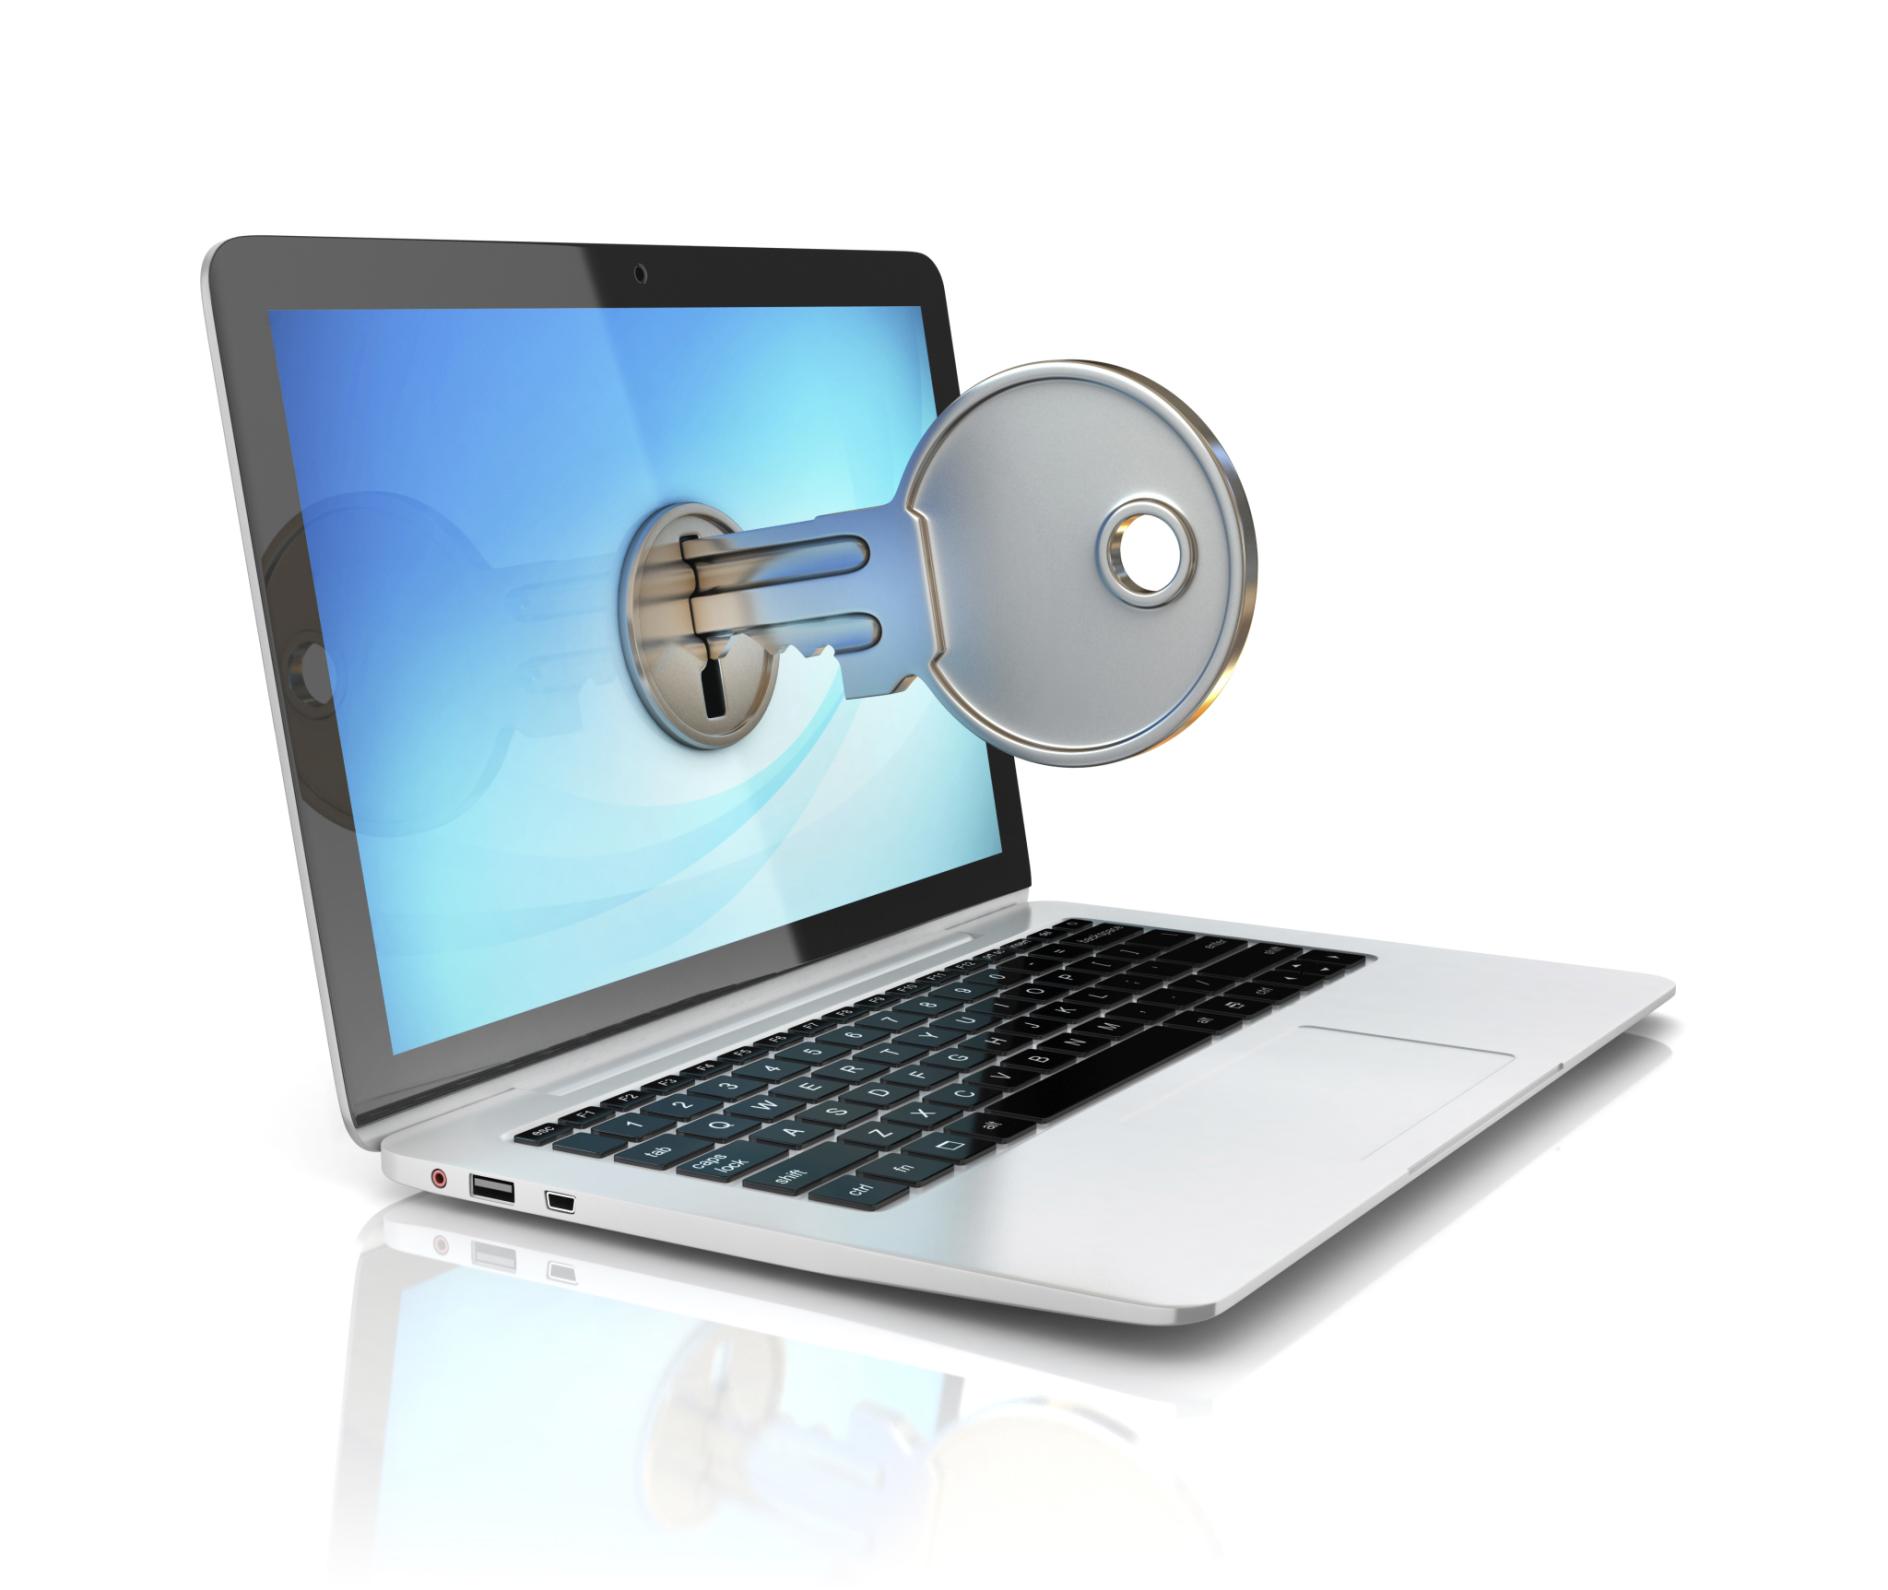 como desbloquear una computadora windows 7